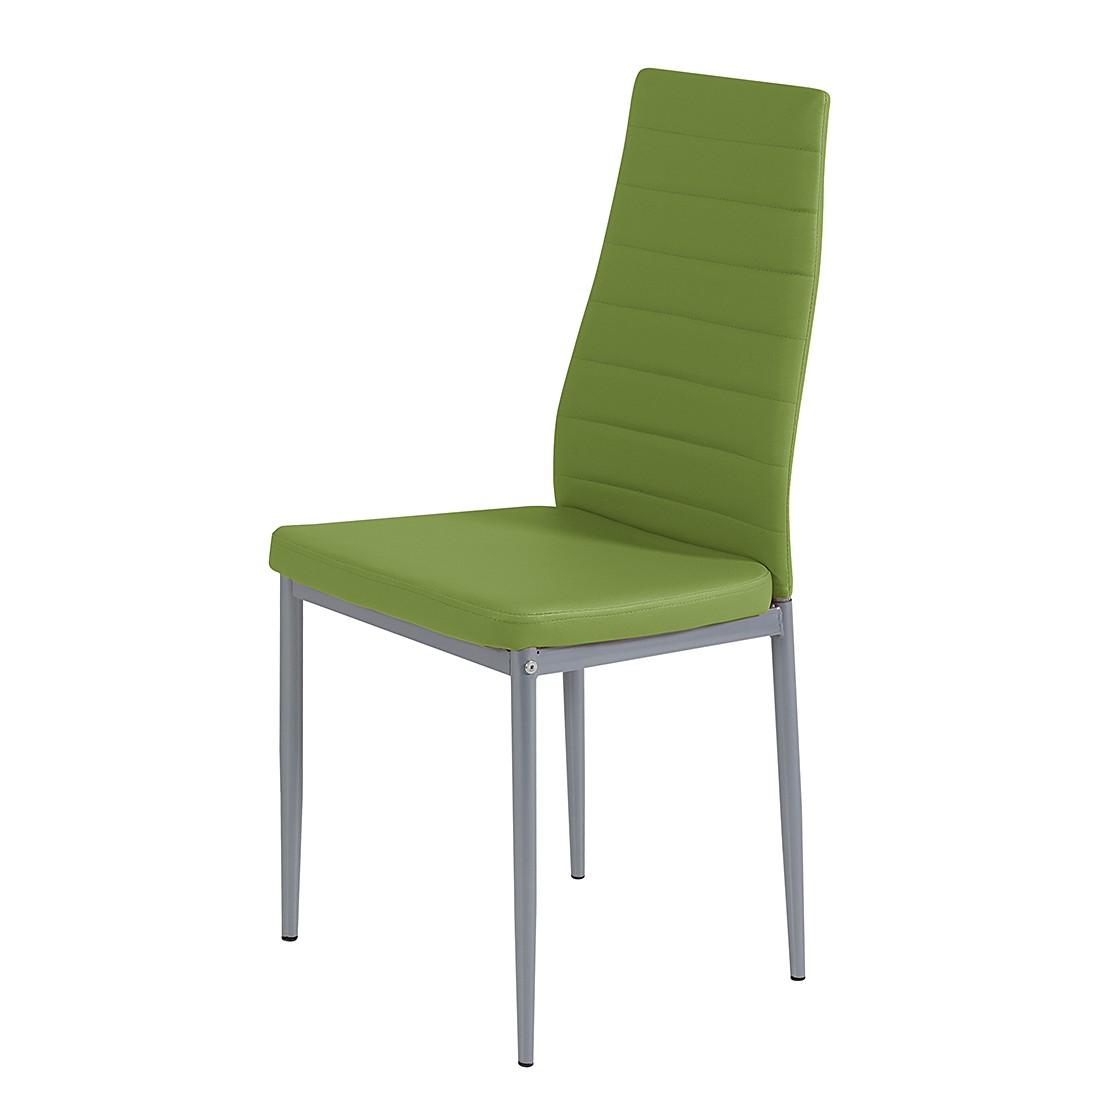 Polsterstuhl Alice Springs (4er-Set) – Kunstleder Apfelgrün, Home Design günstig